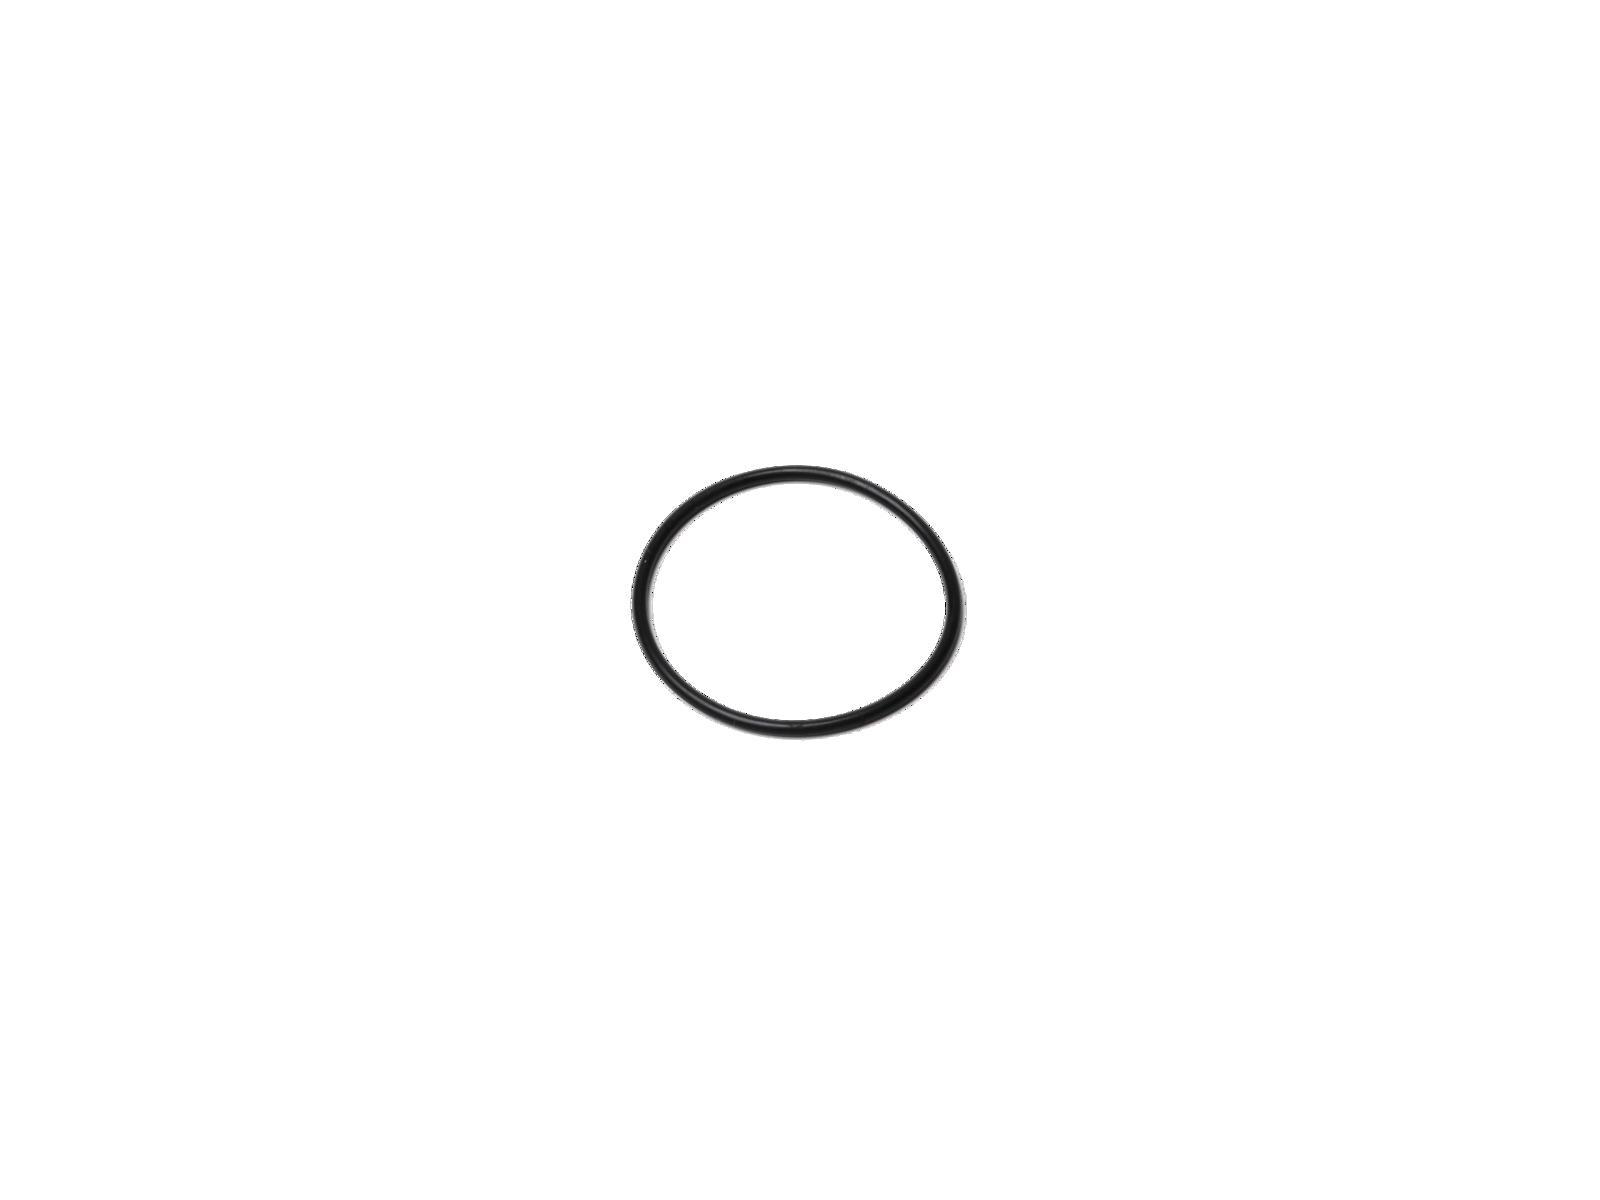 Snap O-ring, gumový kroužek pro Snap kabelový držák, černý, sada 25ks